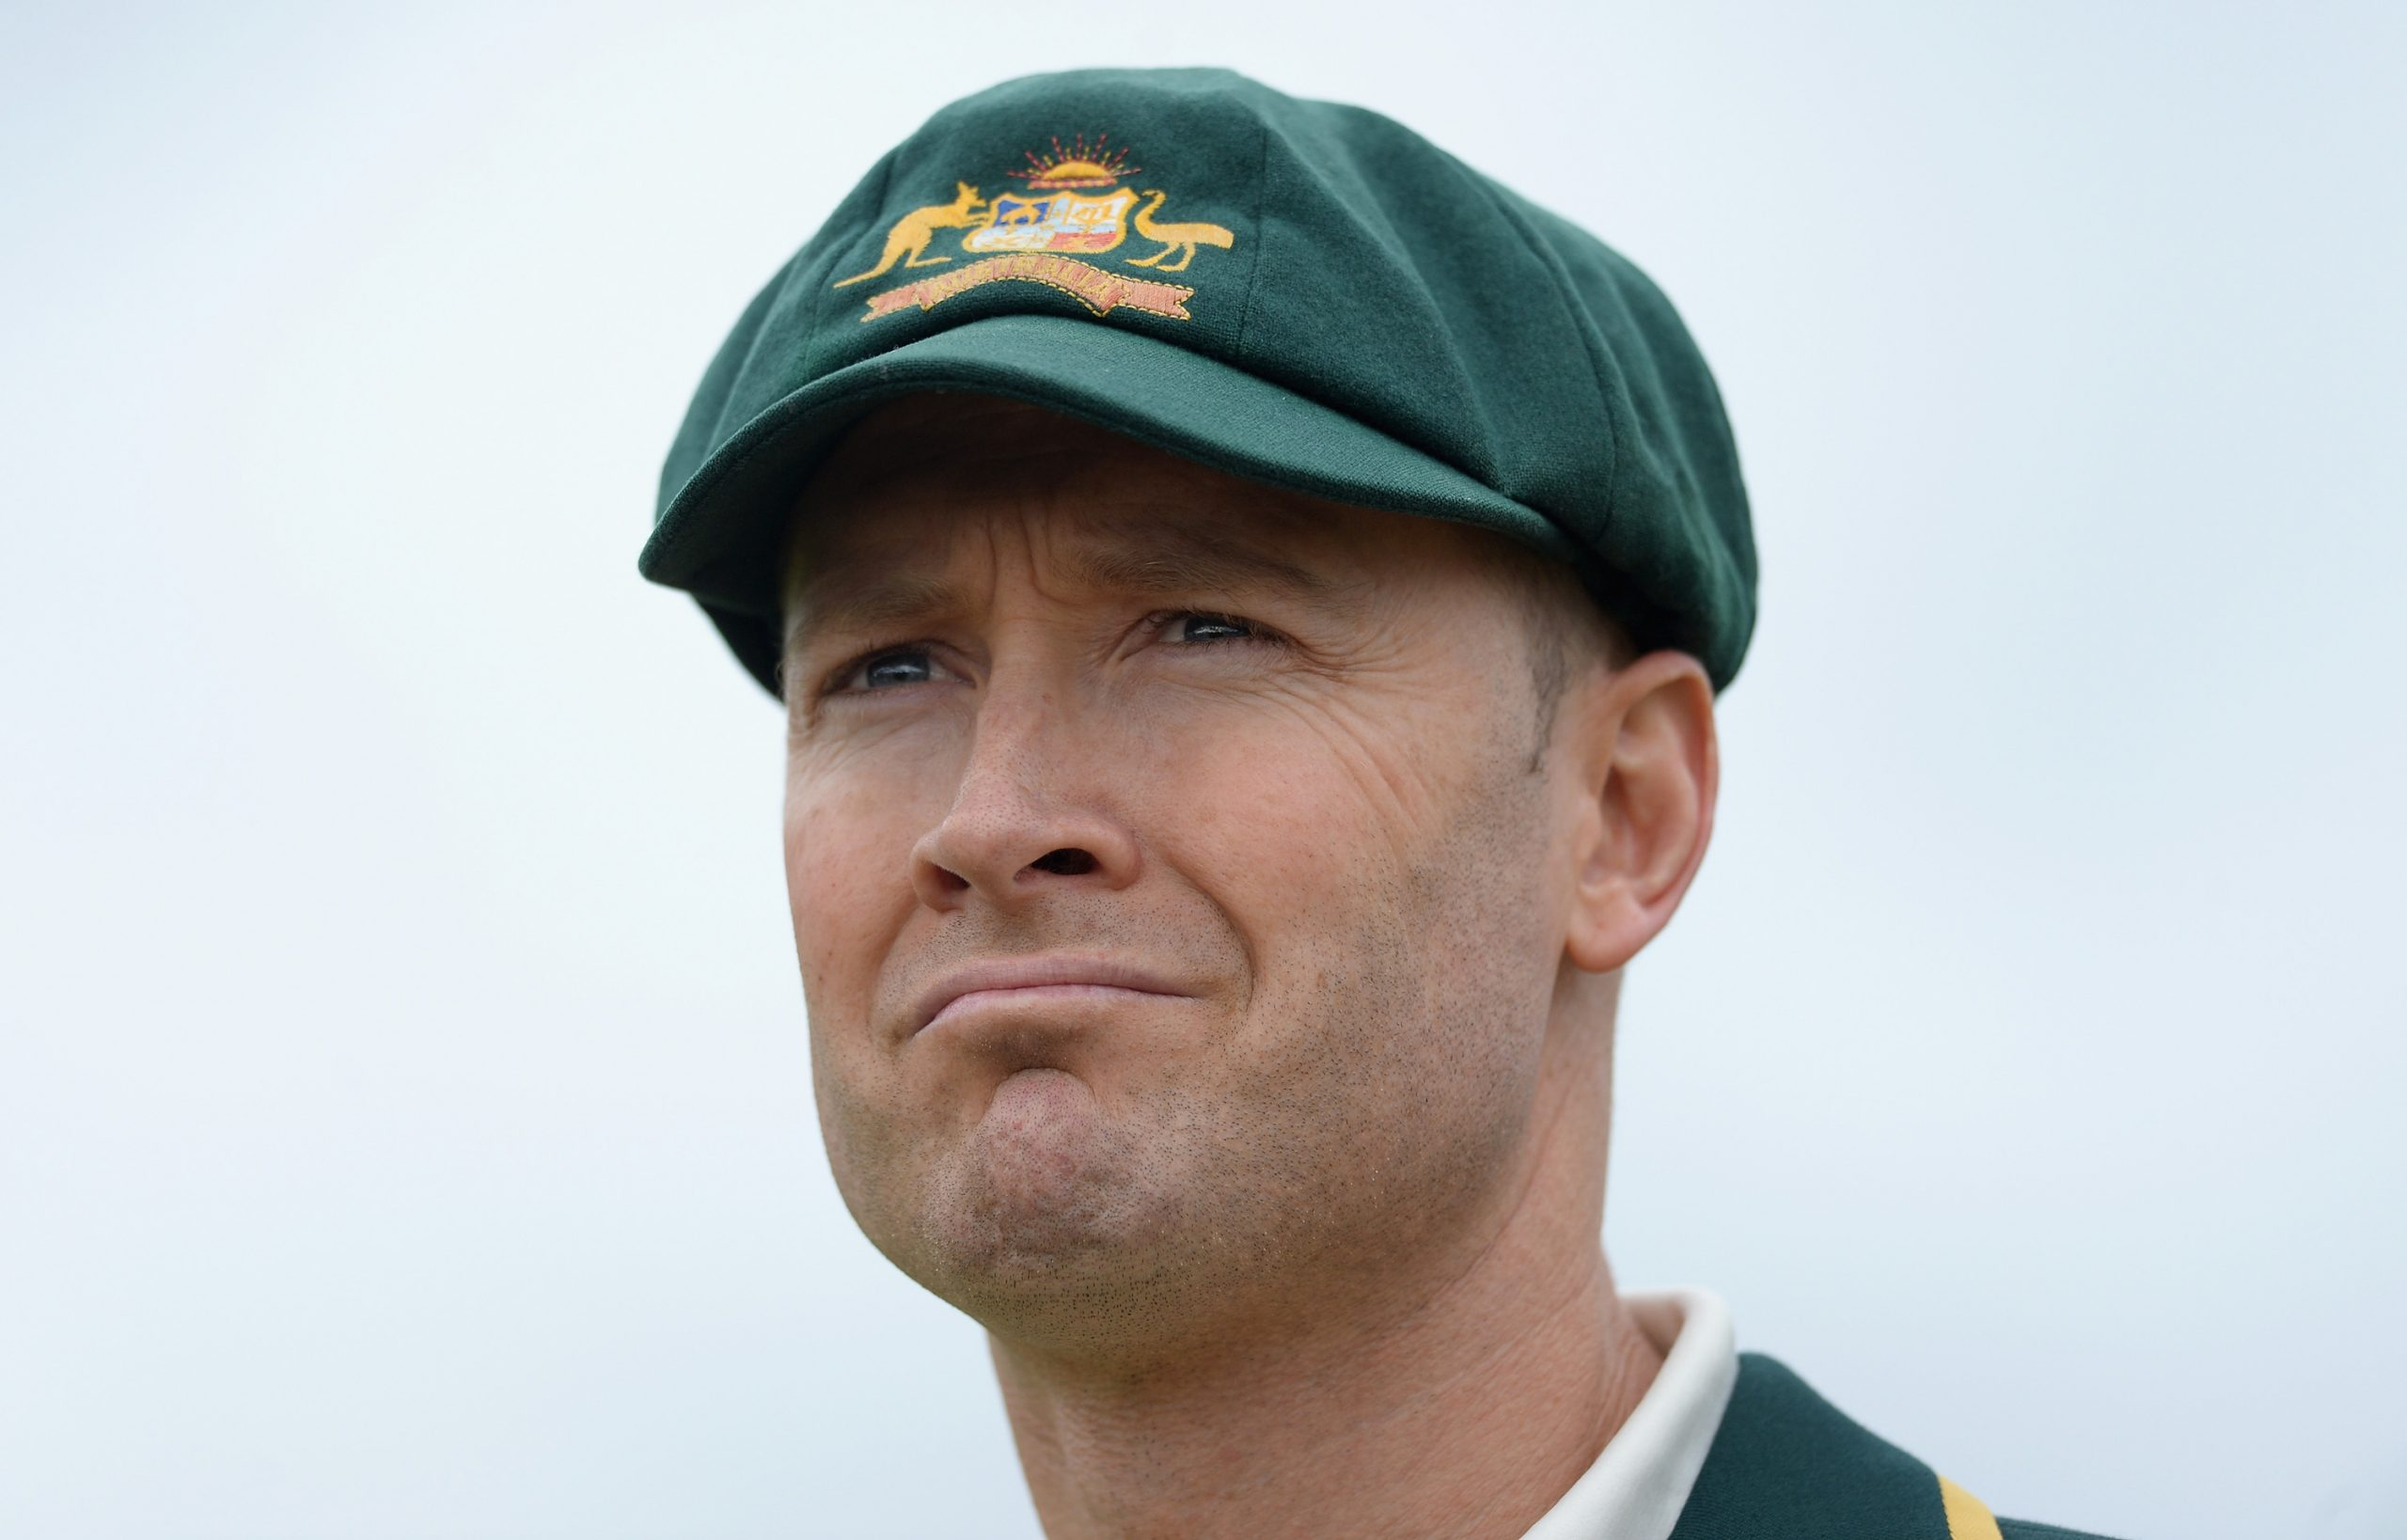 Former Australian captain Michael Clarke (Photo by Gareth Copley/Getty Images)